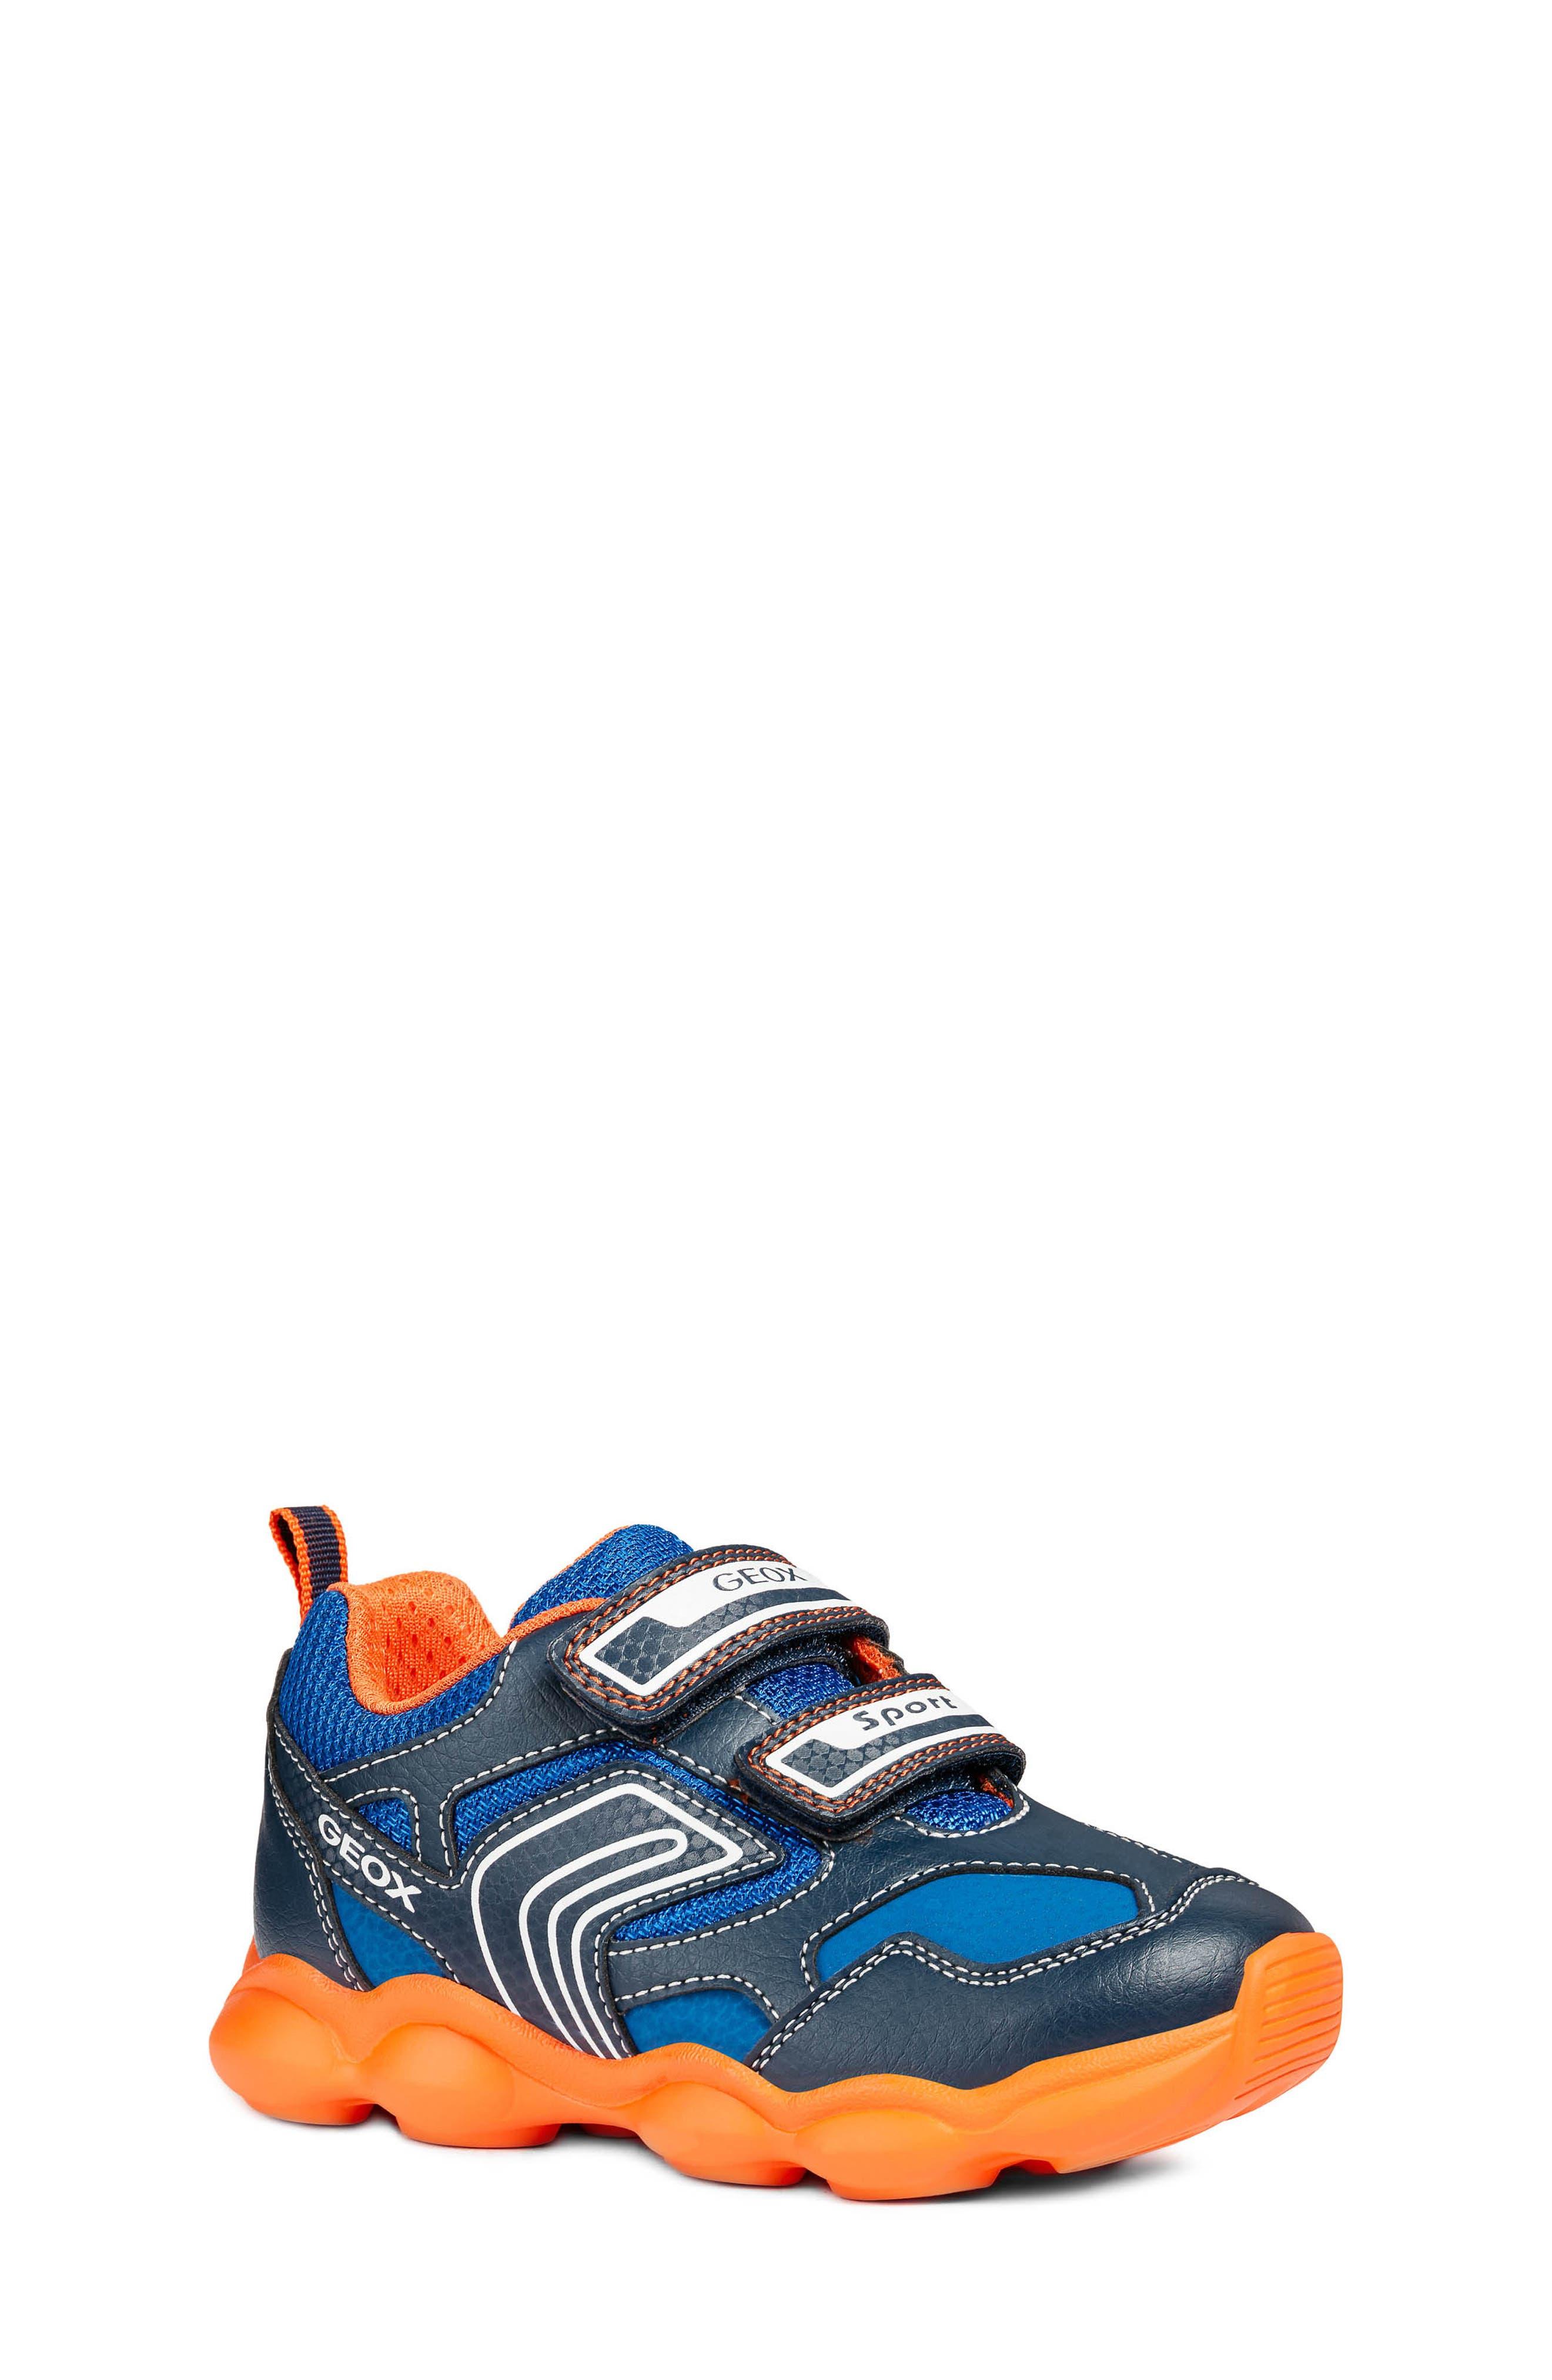 Munfrey Sneaker,                             Main thumbnail 1, color,                             Navy Blue/Orange